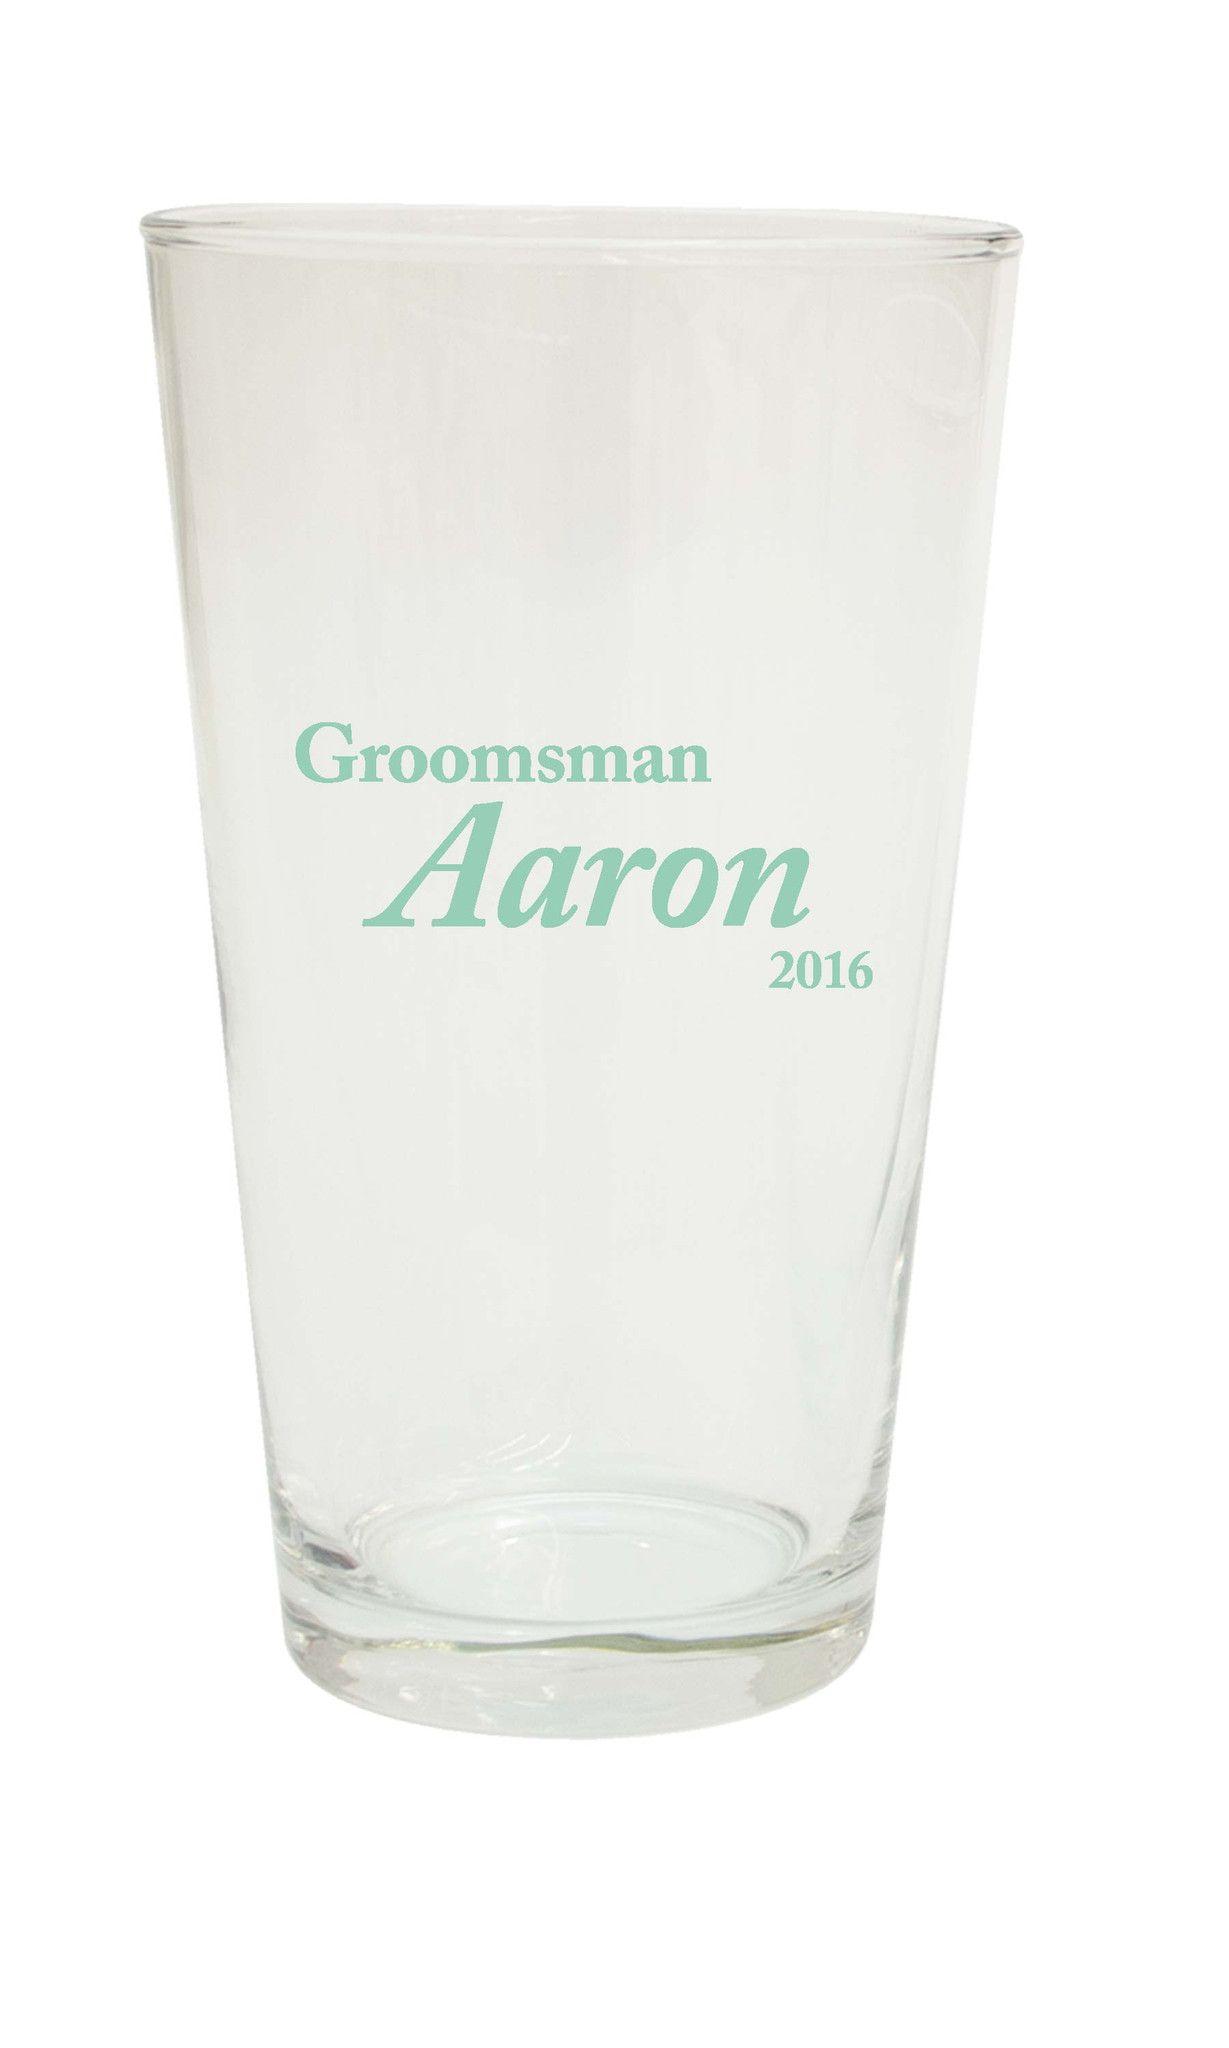 Groomsman Pint, wedding gifts, personalized wedding gifts, groomsman gifts, personalized wedding glass, wedding glass,